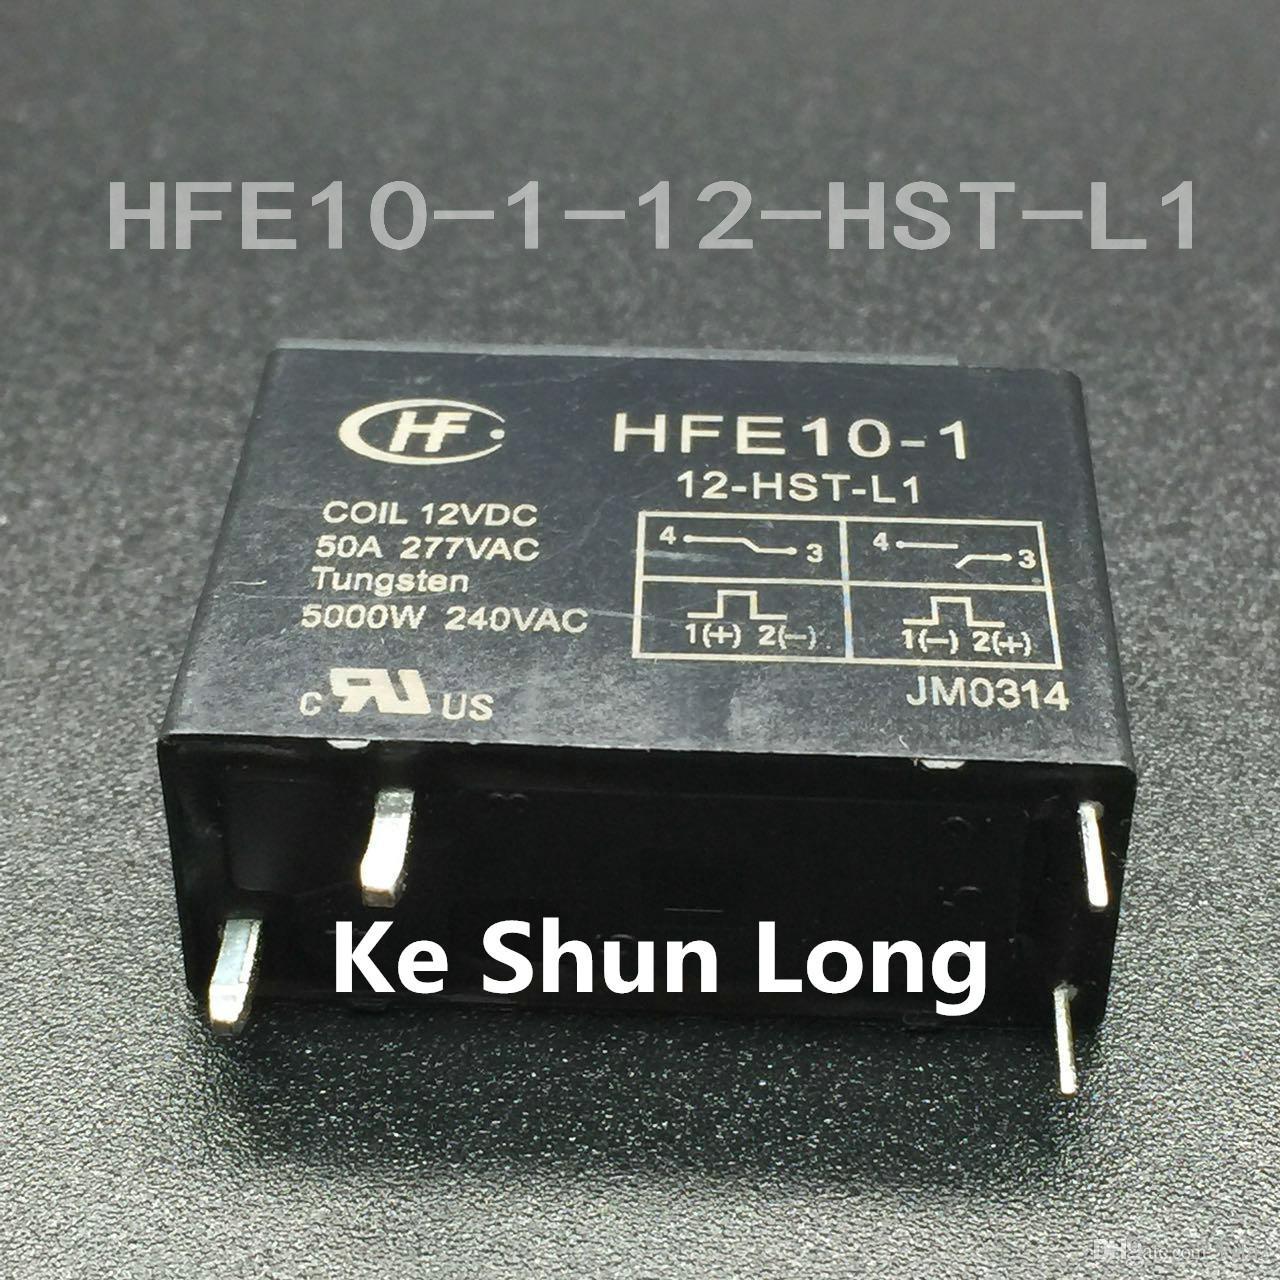 Freies verschiffen lot (5 teile / los) original Neue HONGFA HF HFE10-1-12-HST-L1 4 PINS 50A 12VDC Leistungsrelais